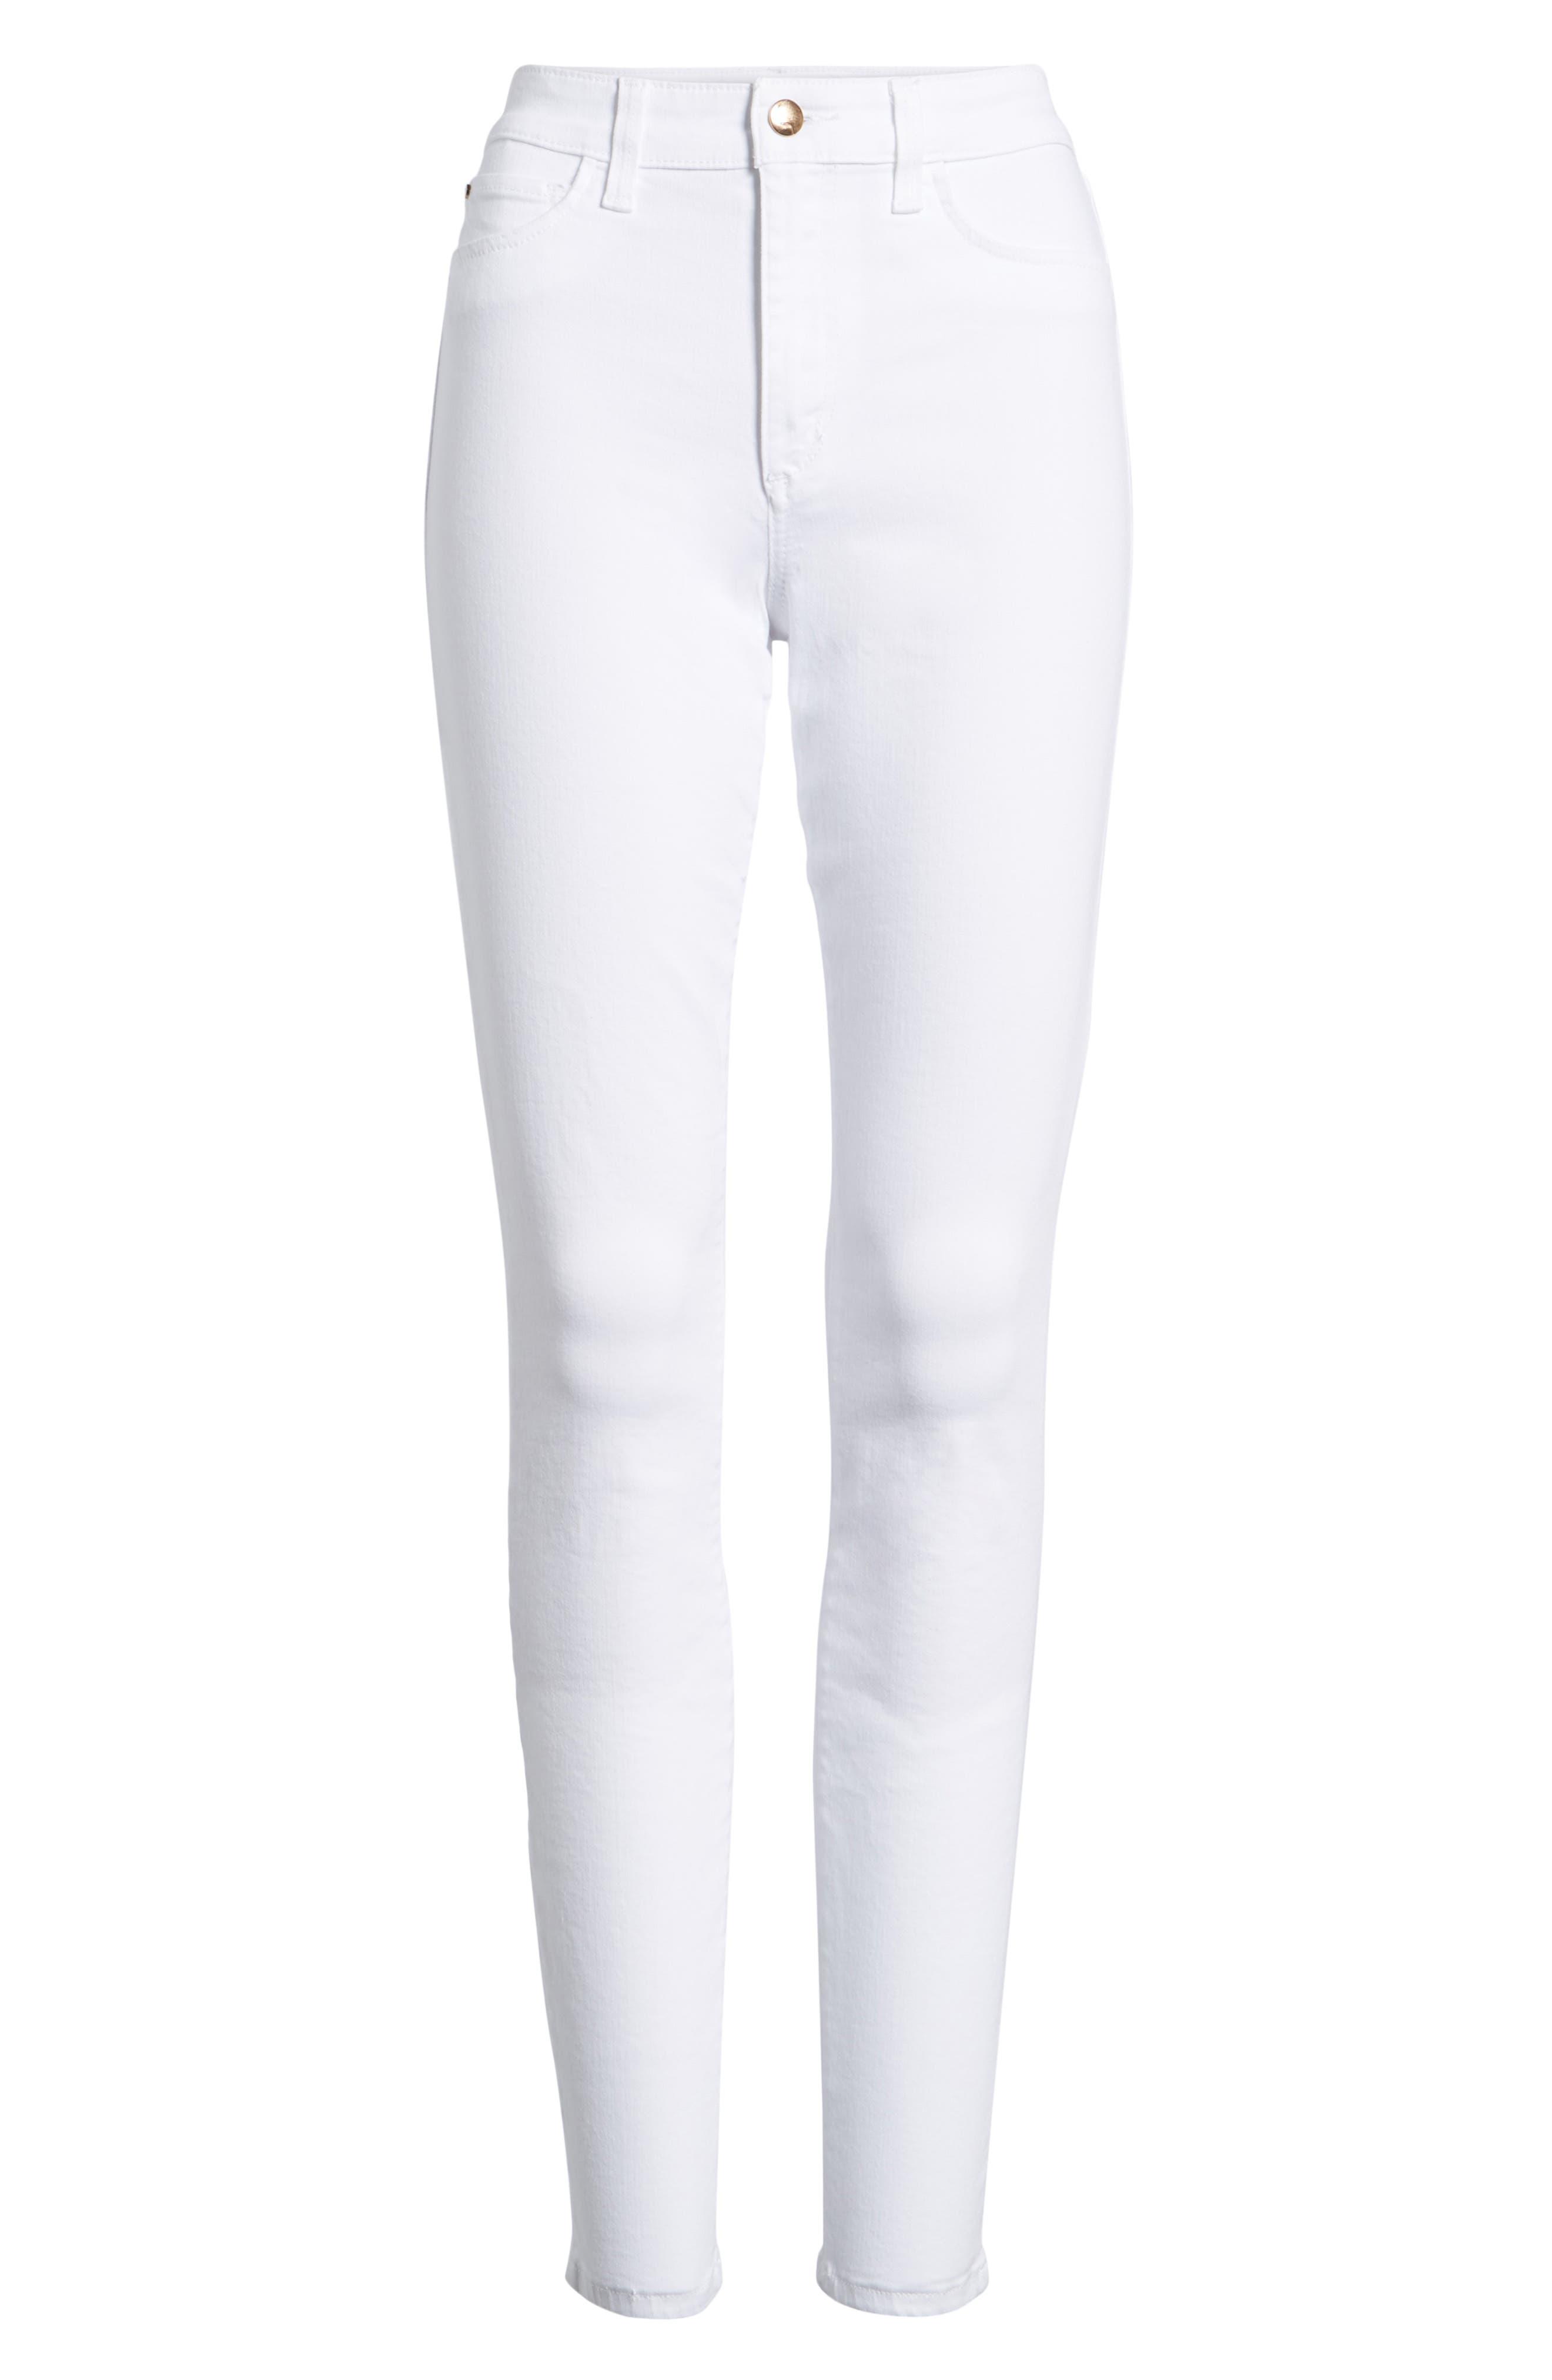 Charlie Skinny Jeans,                             Alternate thumbnail 7, color,                             120